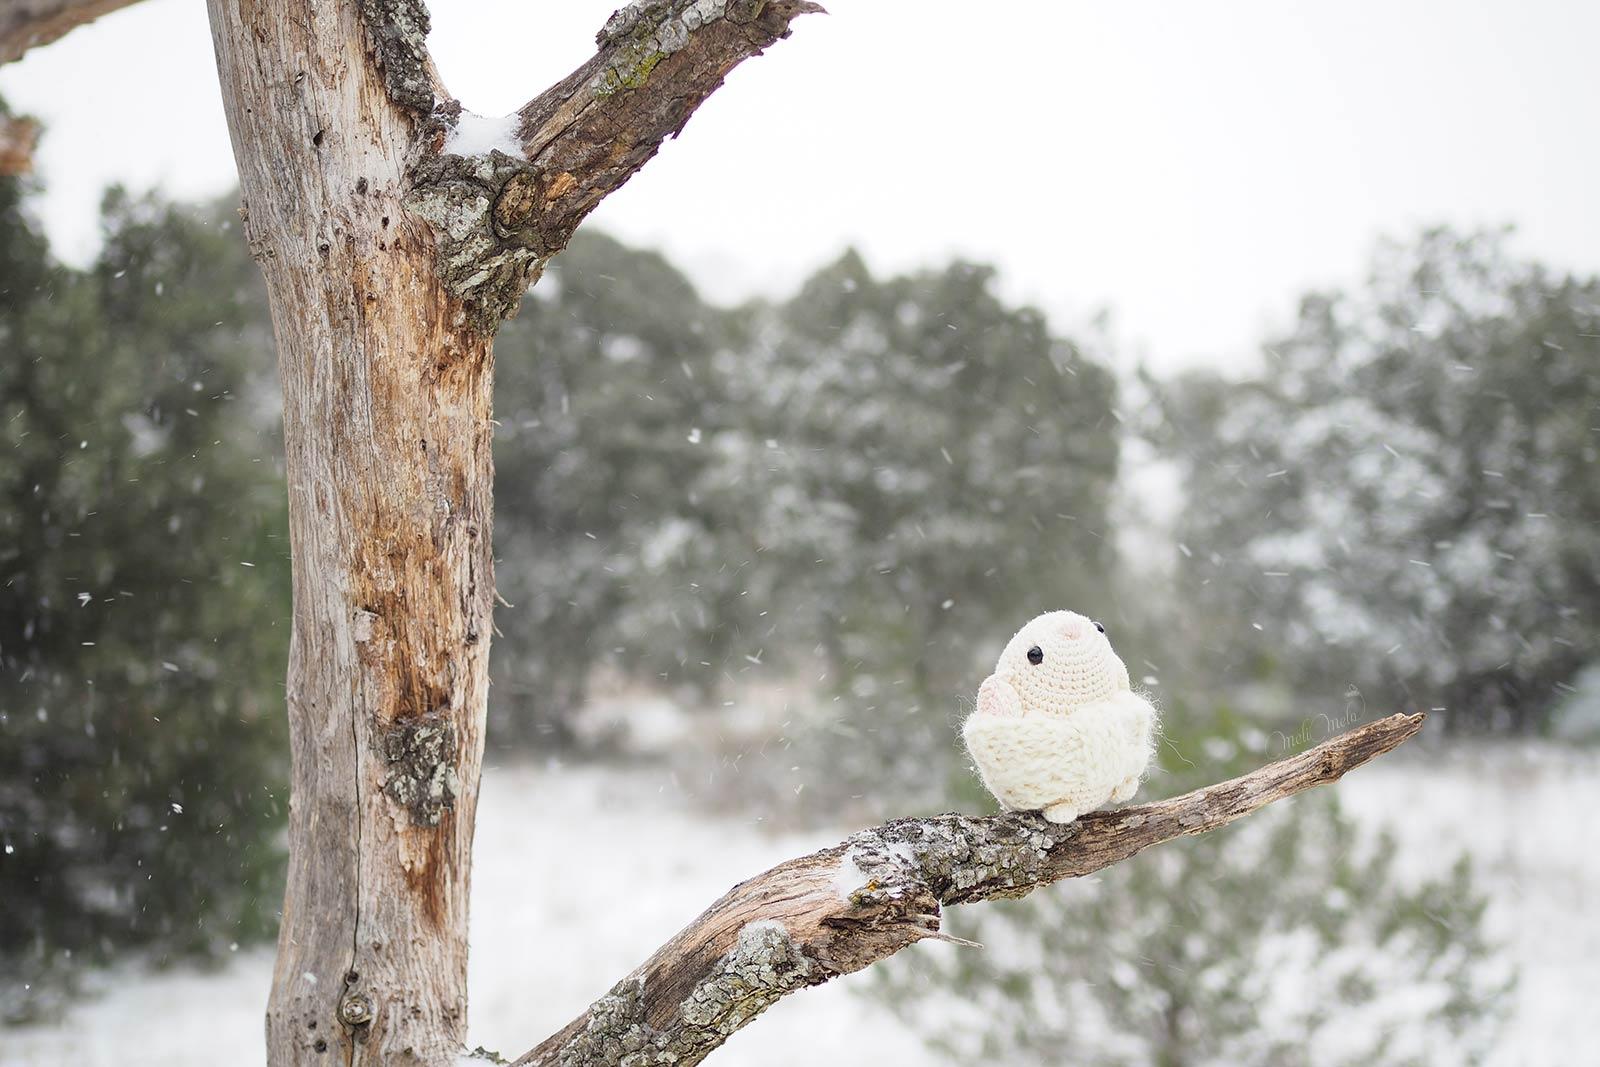 amigurumi-souris-crochet-tempete-filomena-neige-laboutiquedemelimelo